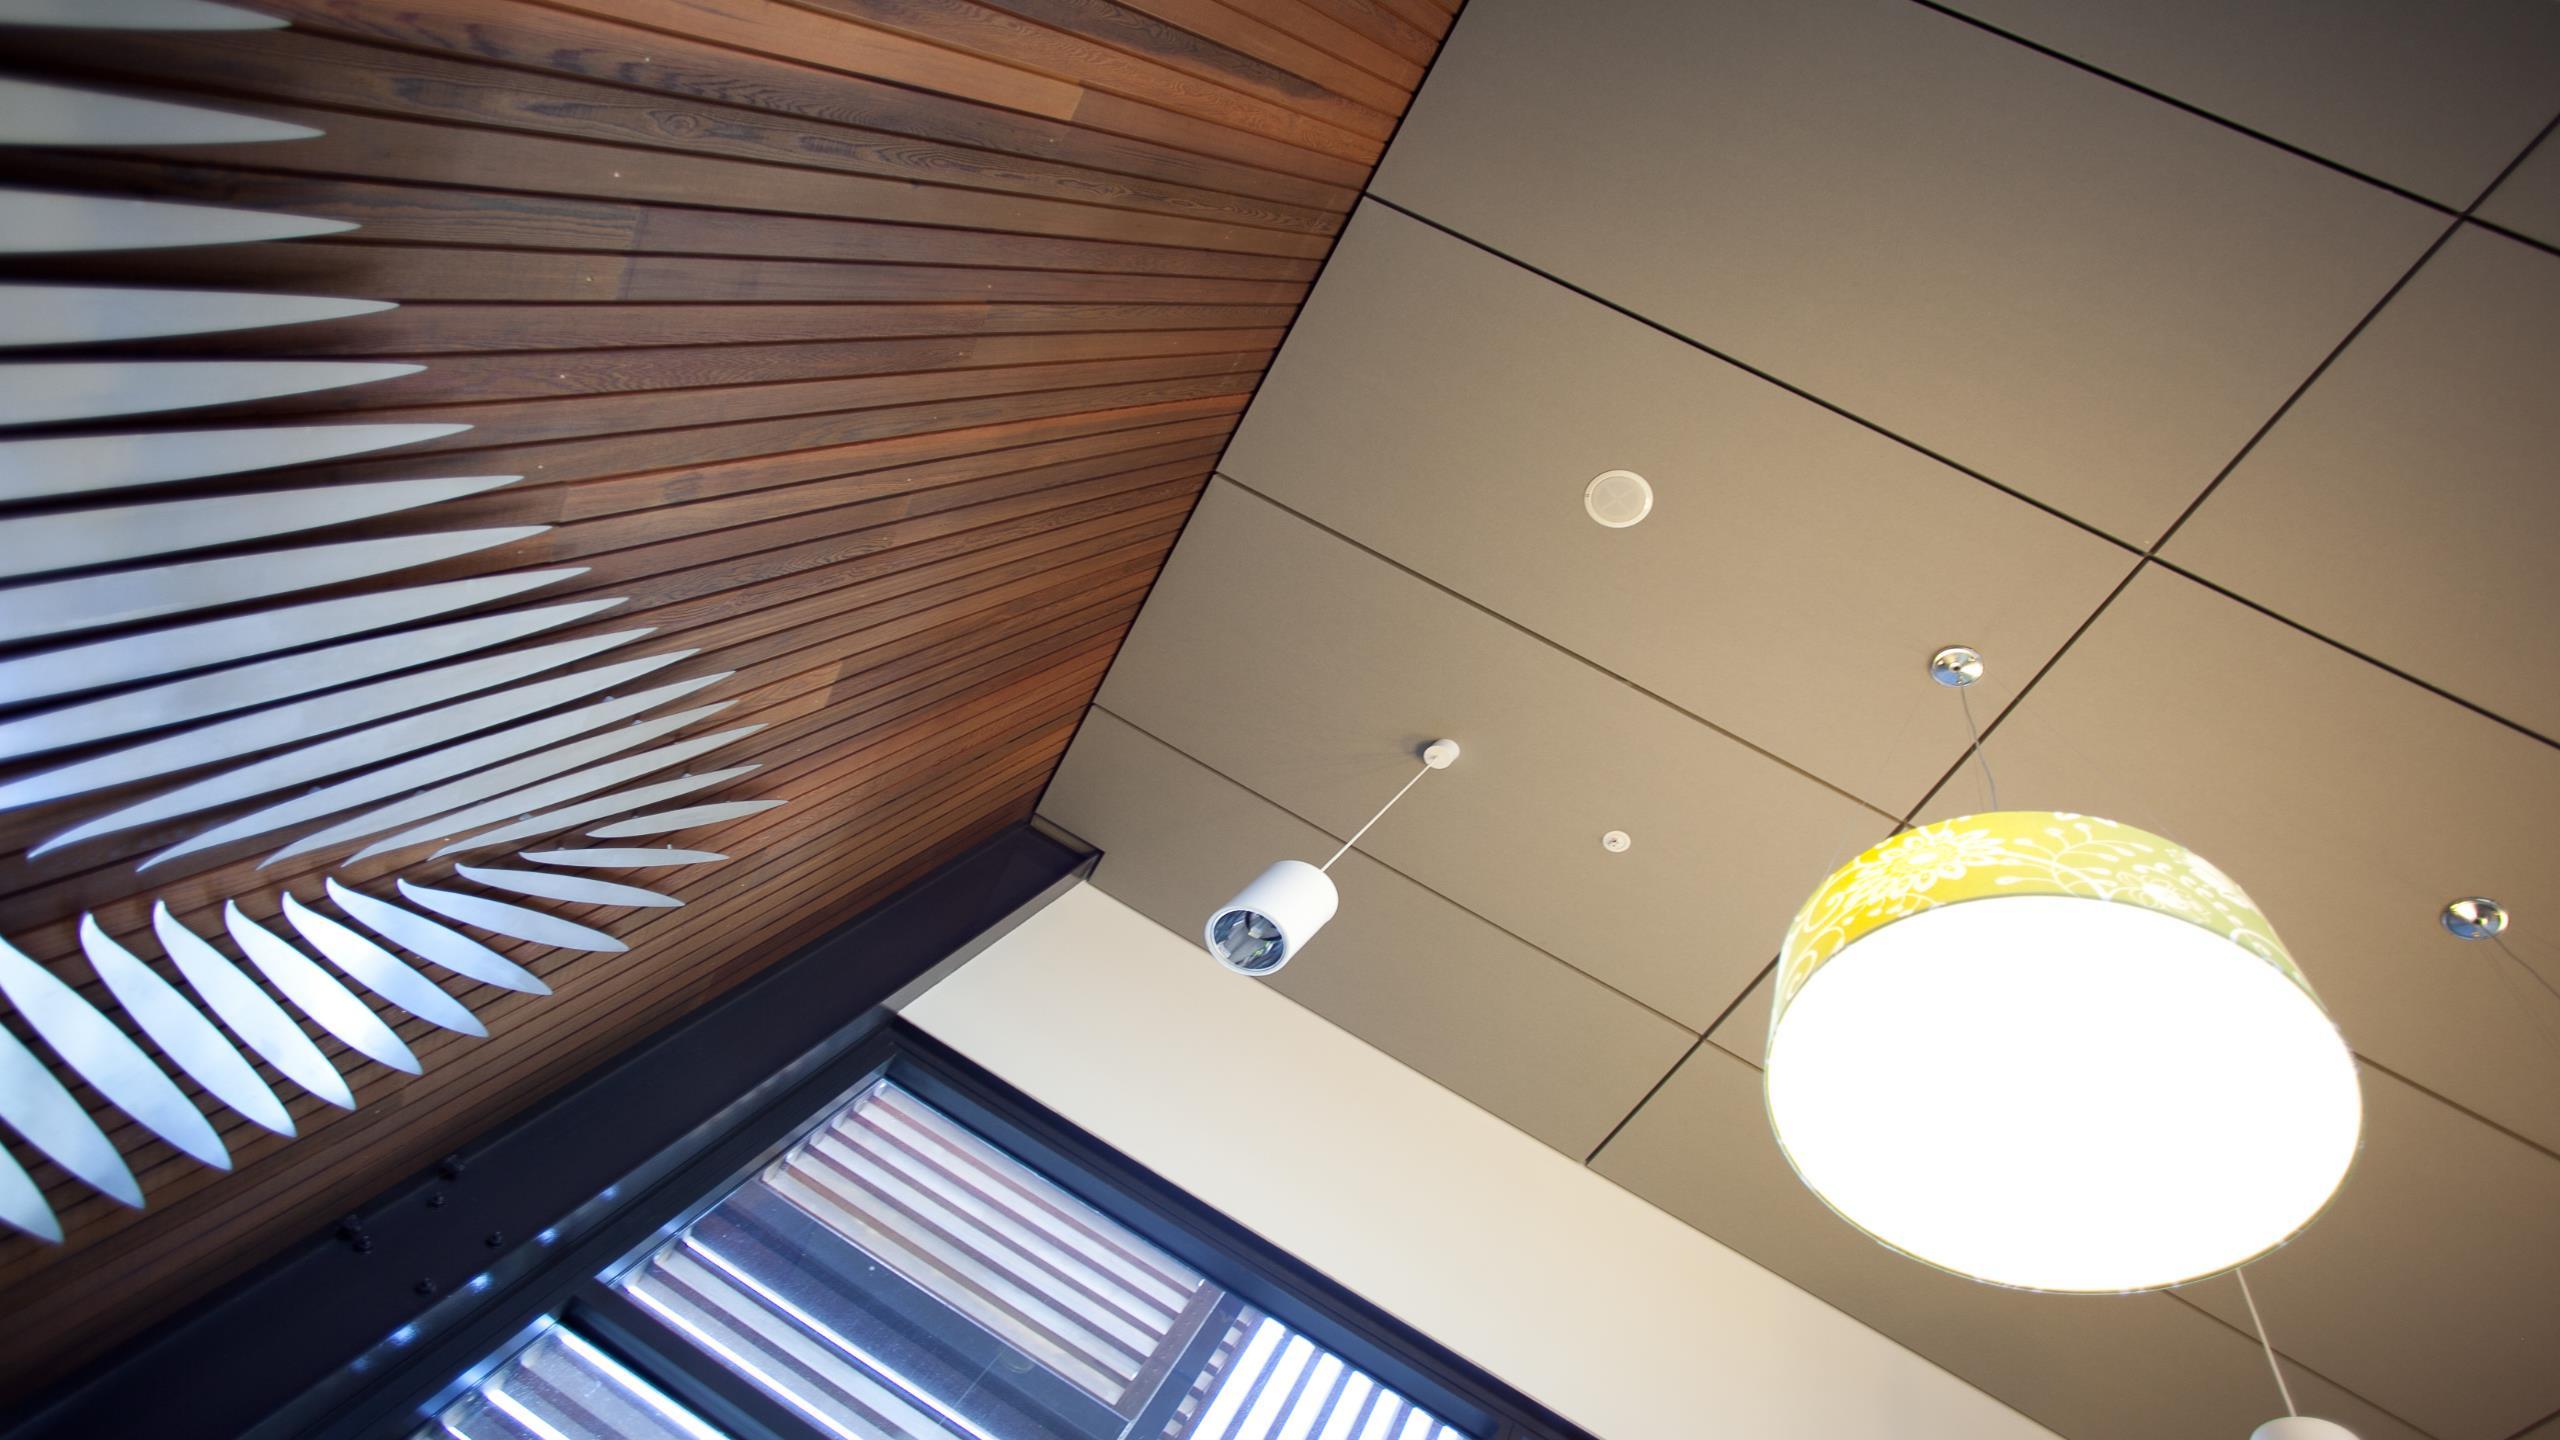 Cancer Society Lions Lodge - Triton Cloud 50 in grey Sonatex facing